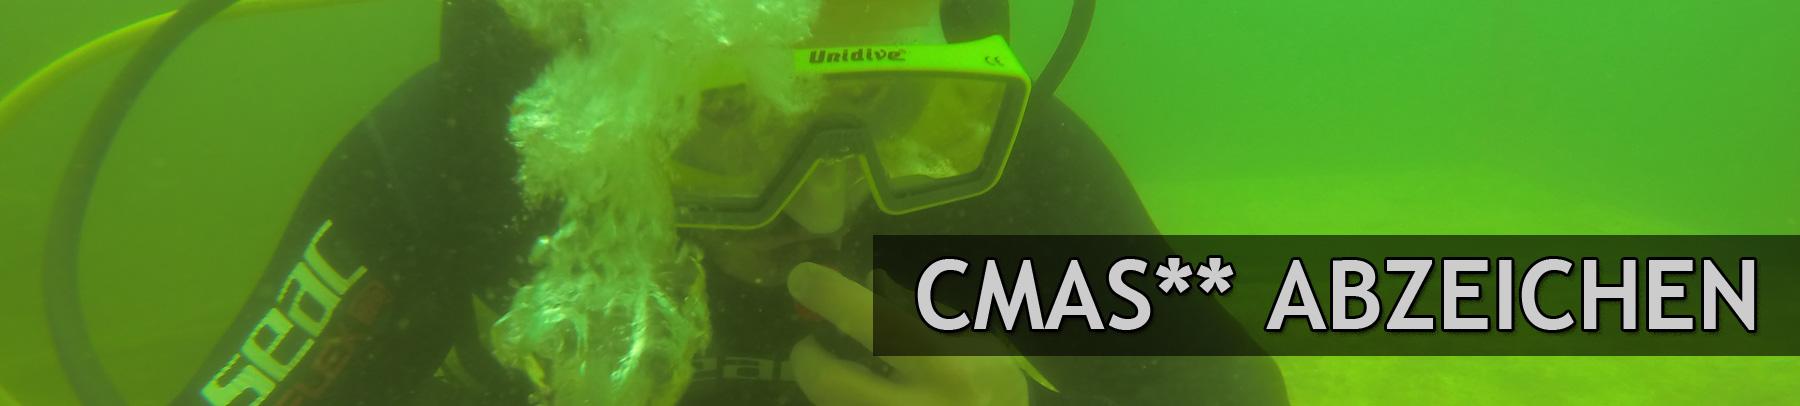 Kategorie-header-CMAS